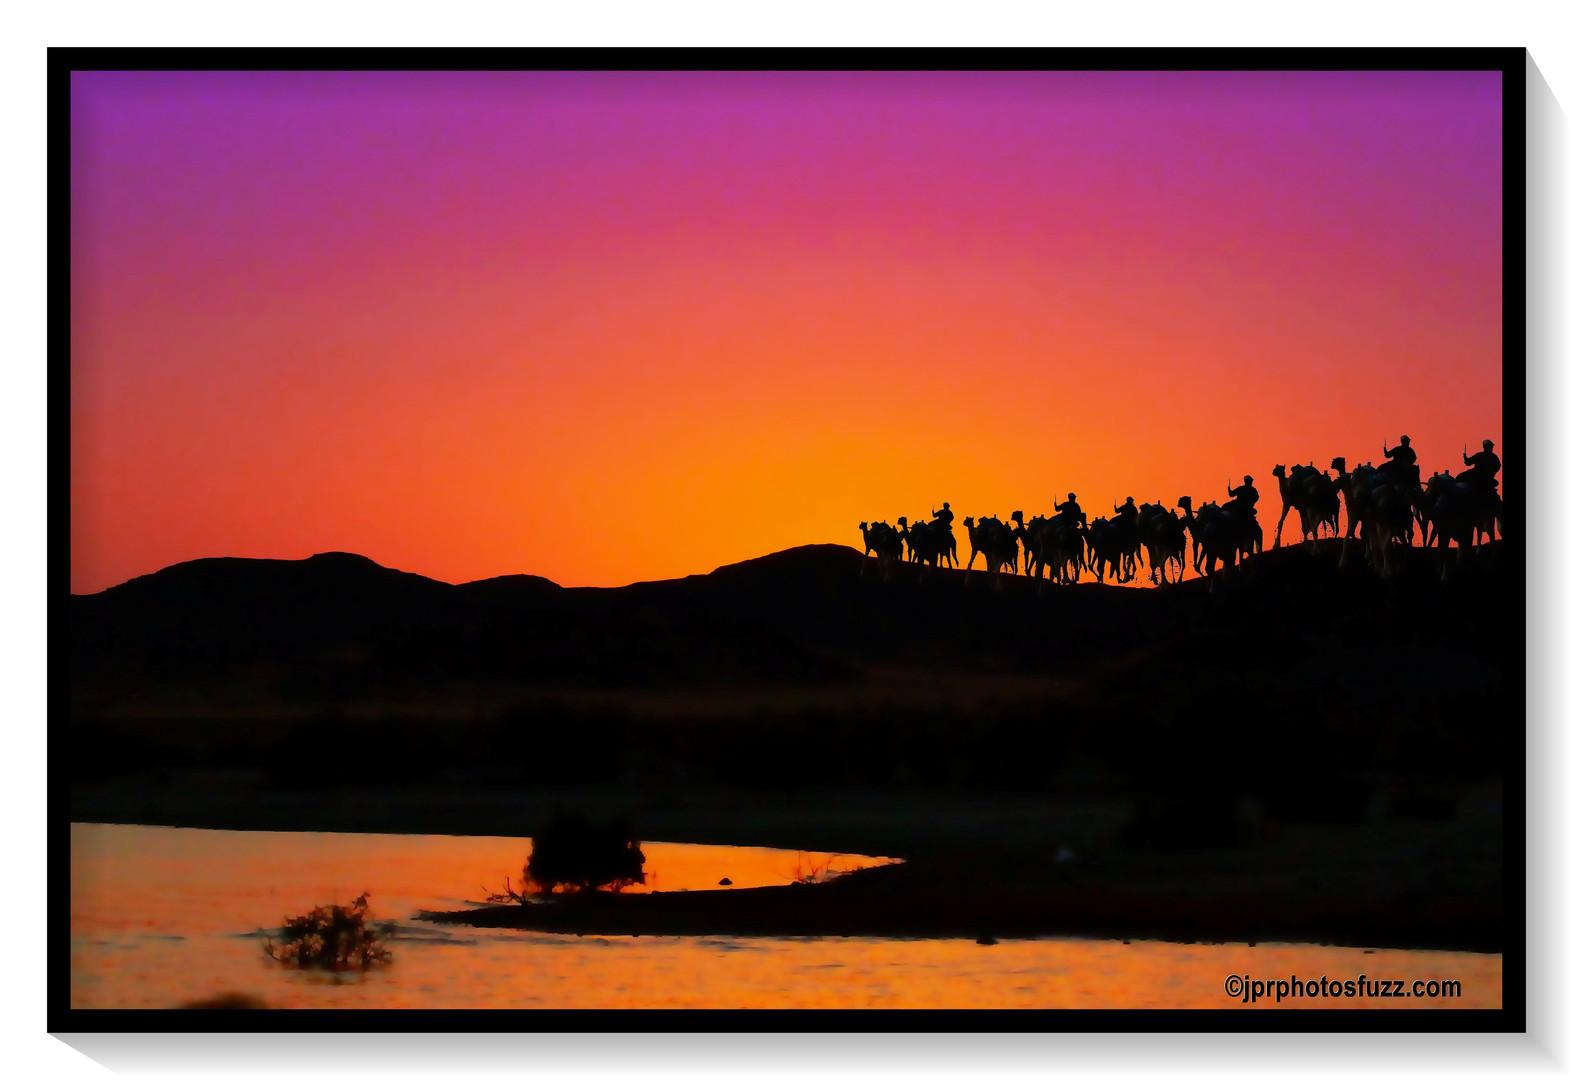 ABOU SINBEL Camel 4 - Egypte